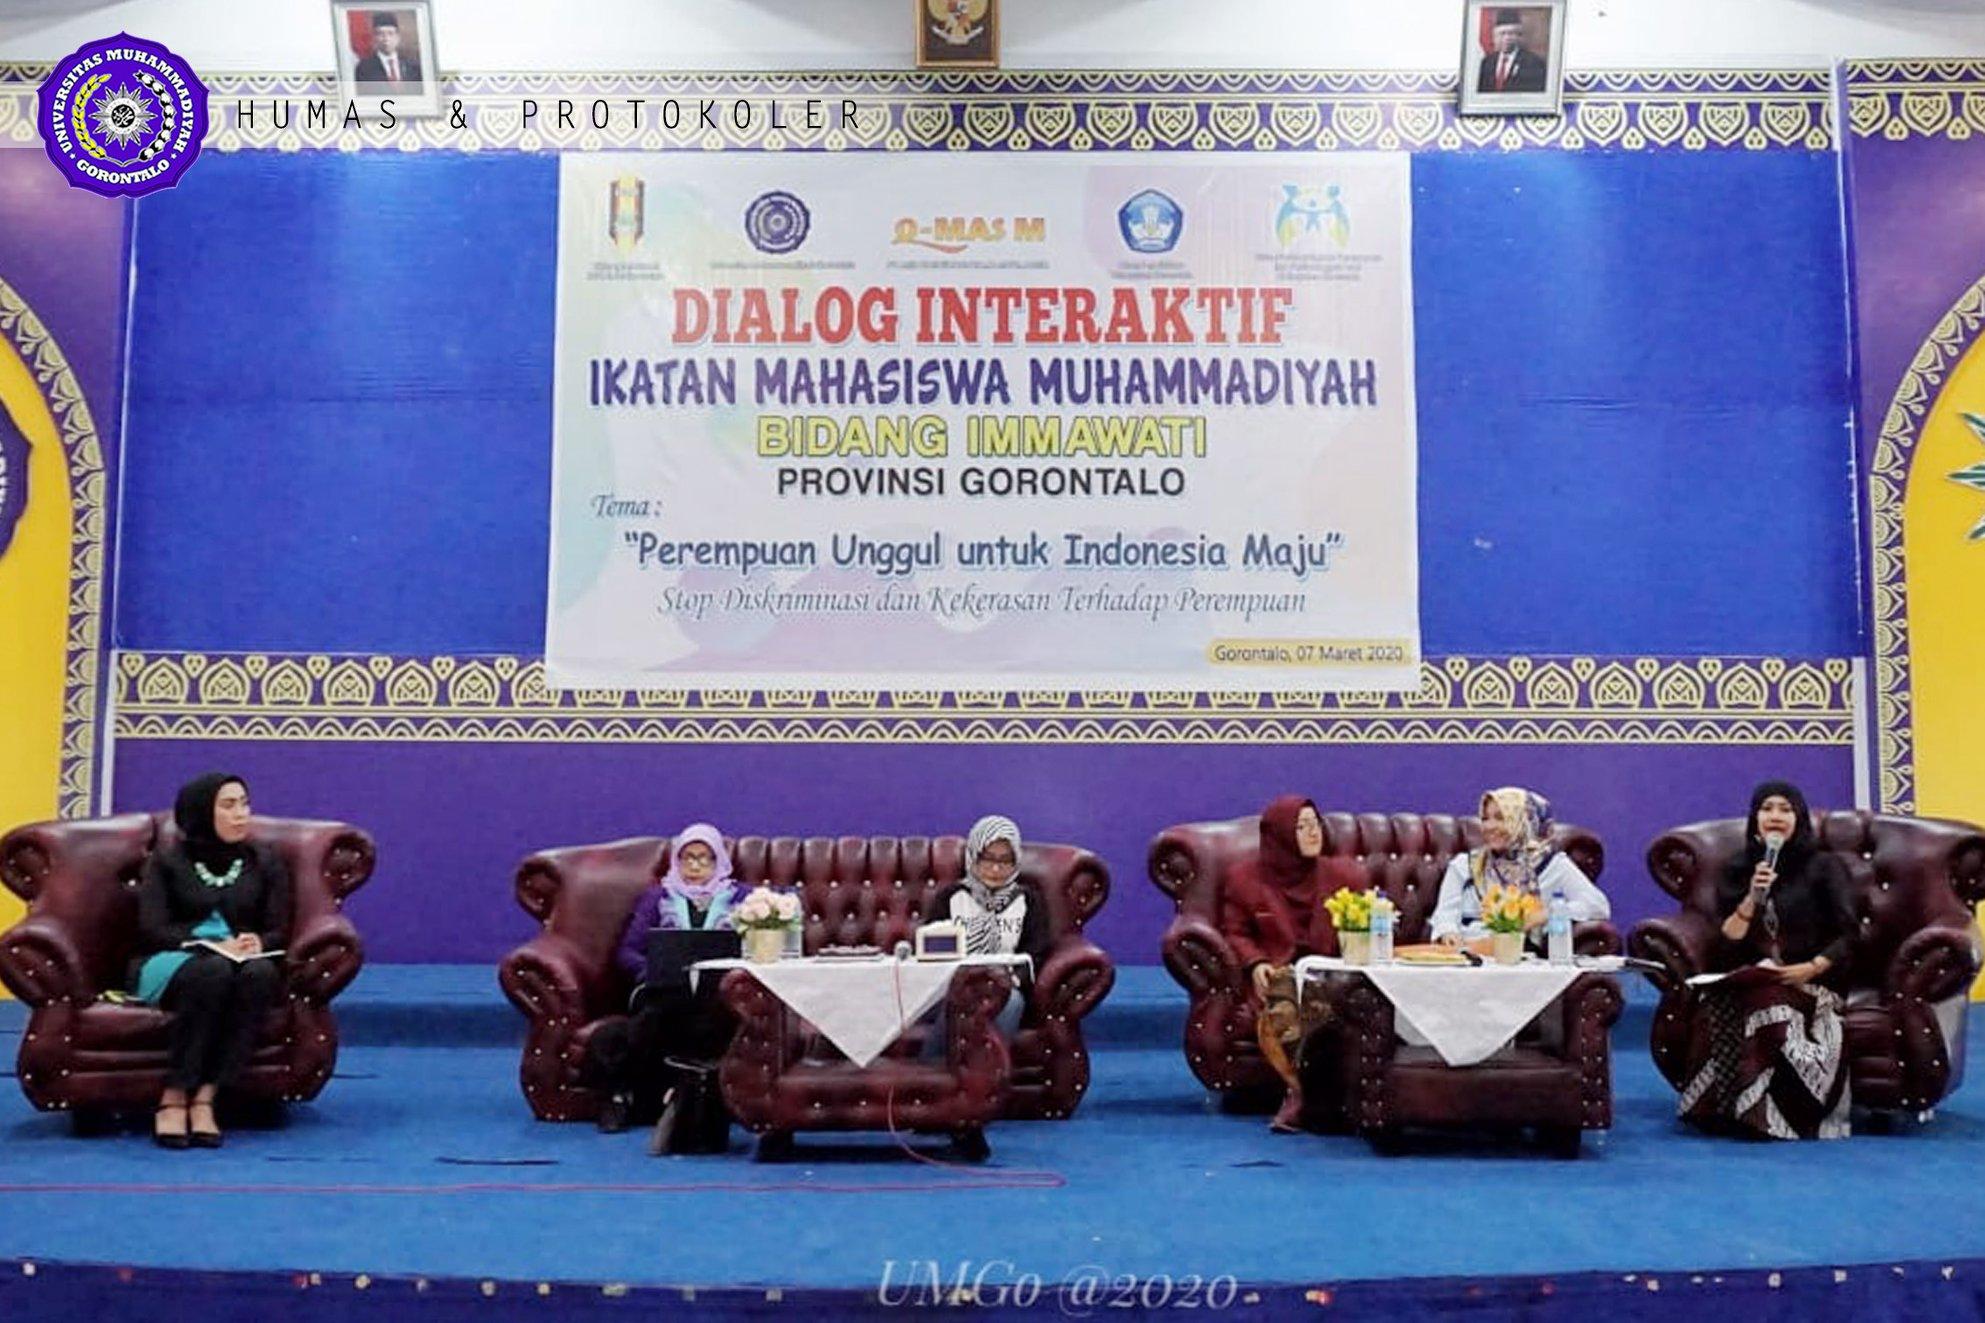 Diaog Interaktif, Prof Moon : Perempuan Lebih Multitasking Dibanding Laki-Laki